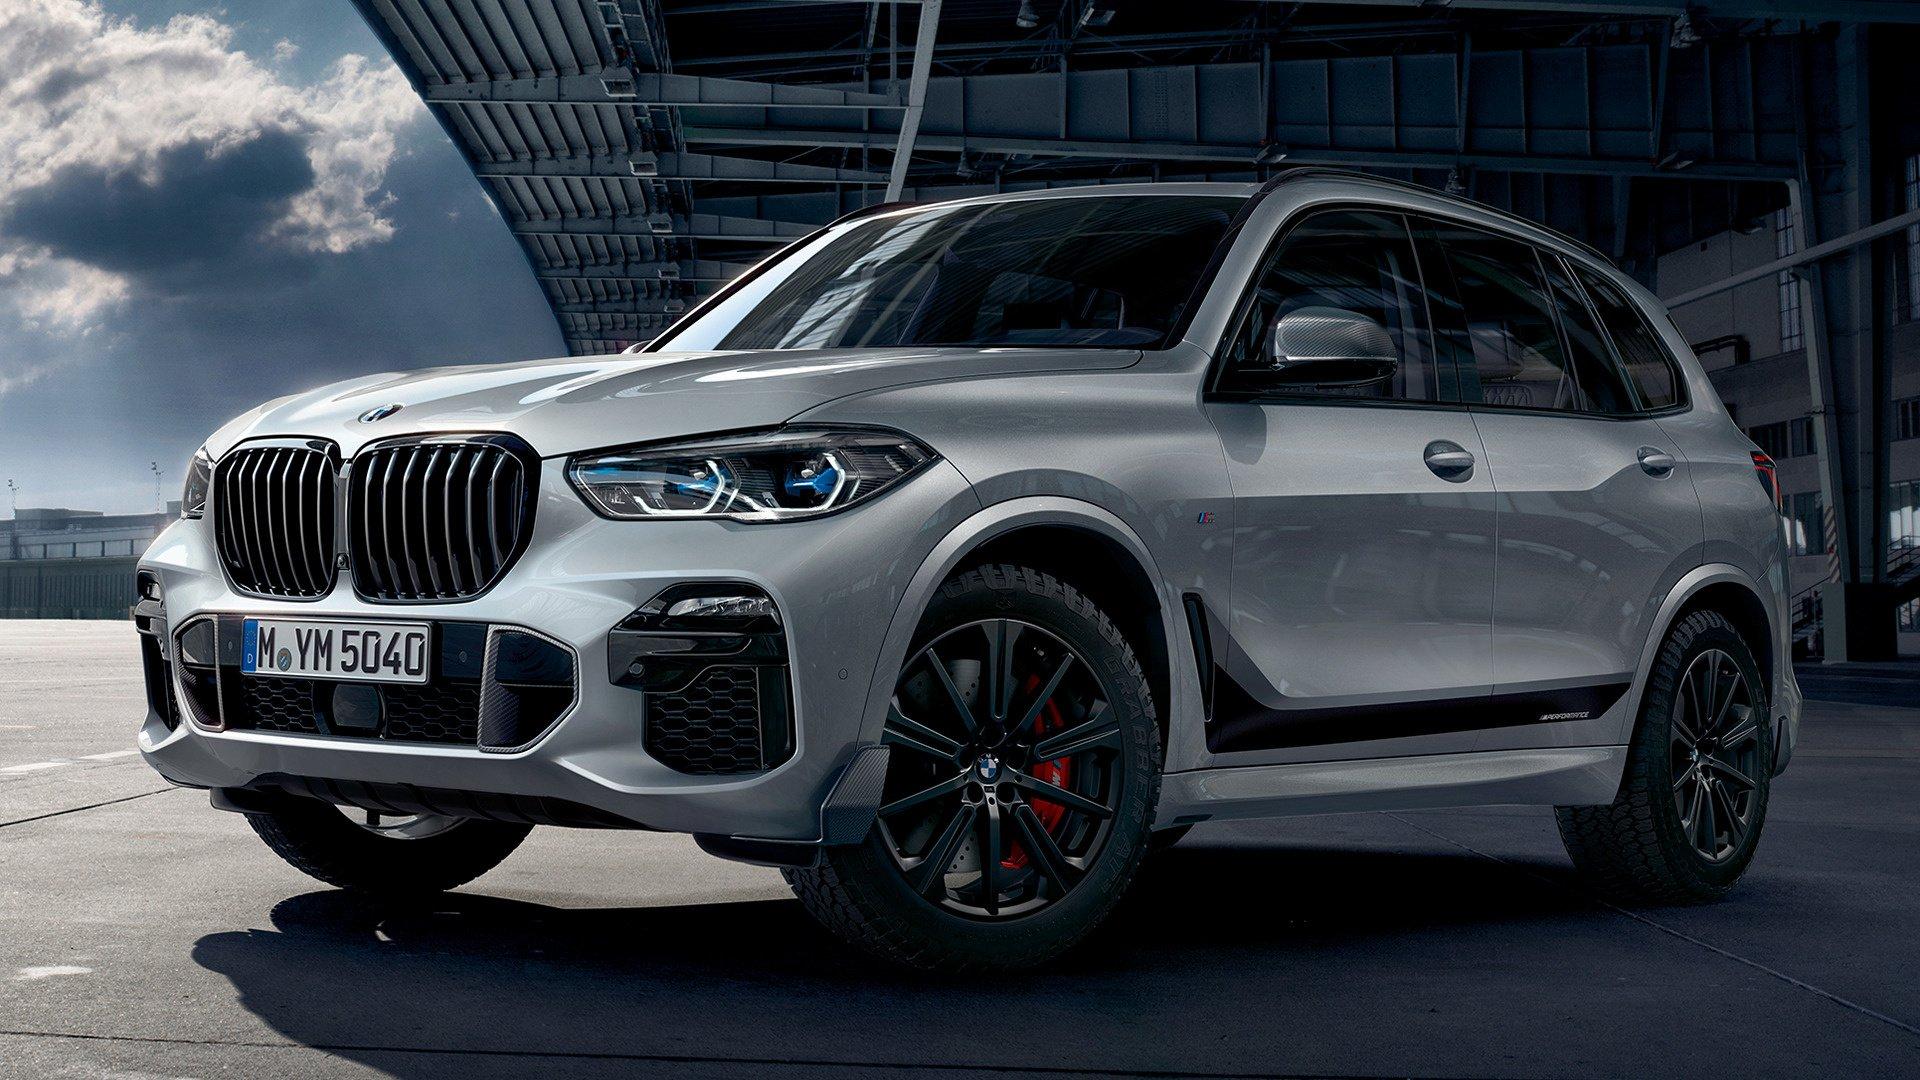 2018 BMW X5 HD Wallpaper | Background Image | 1920x1080 ...